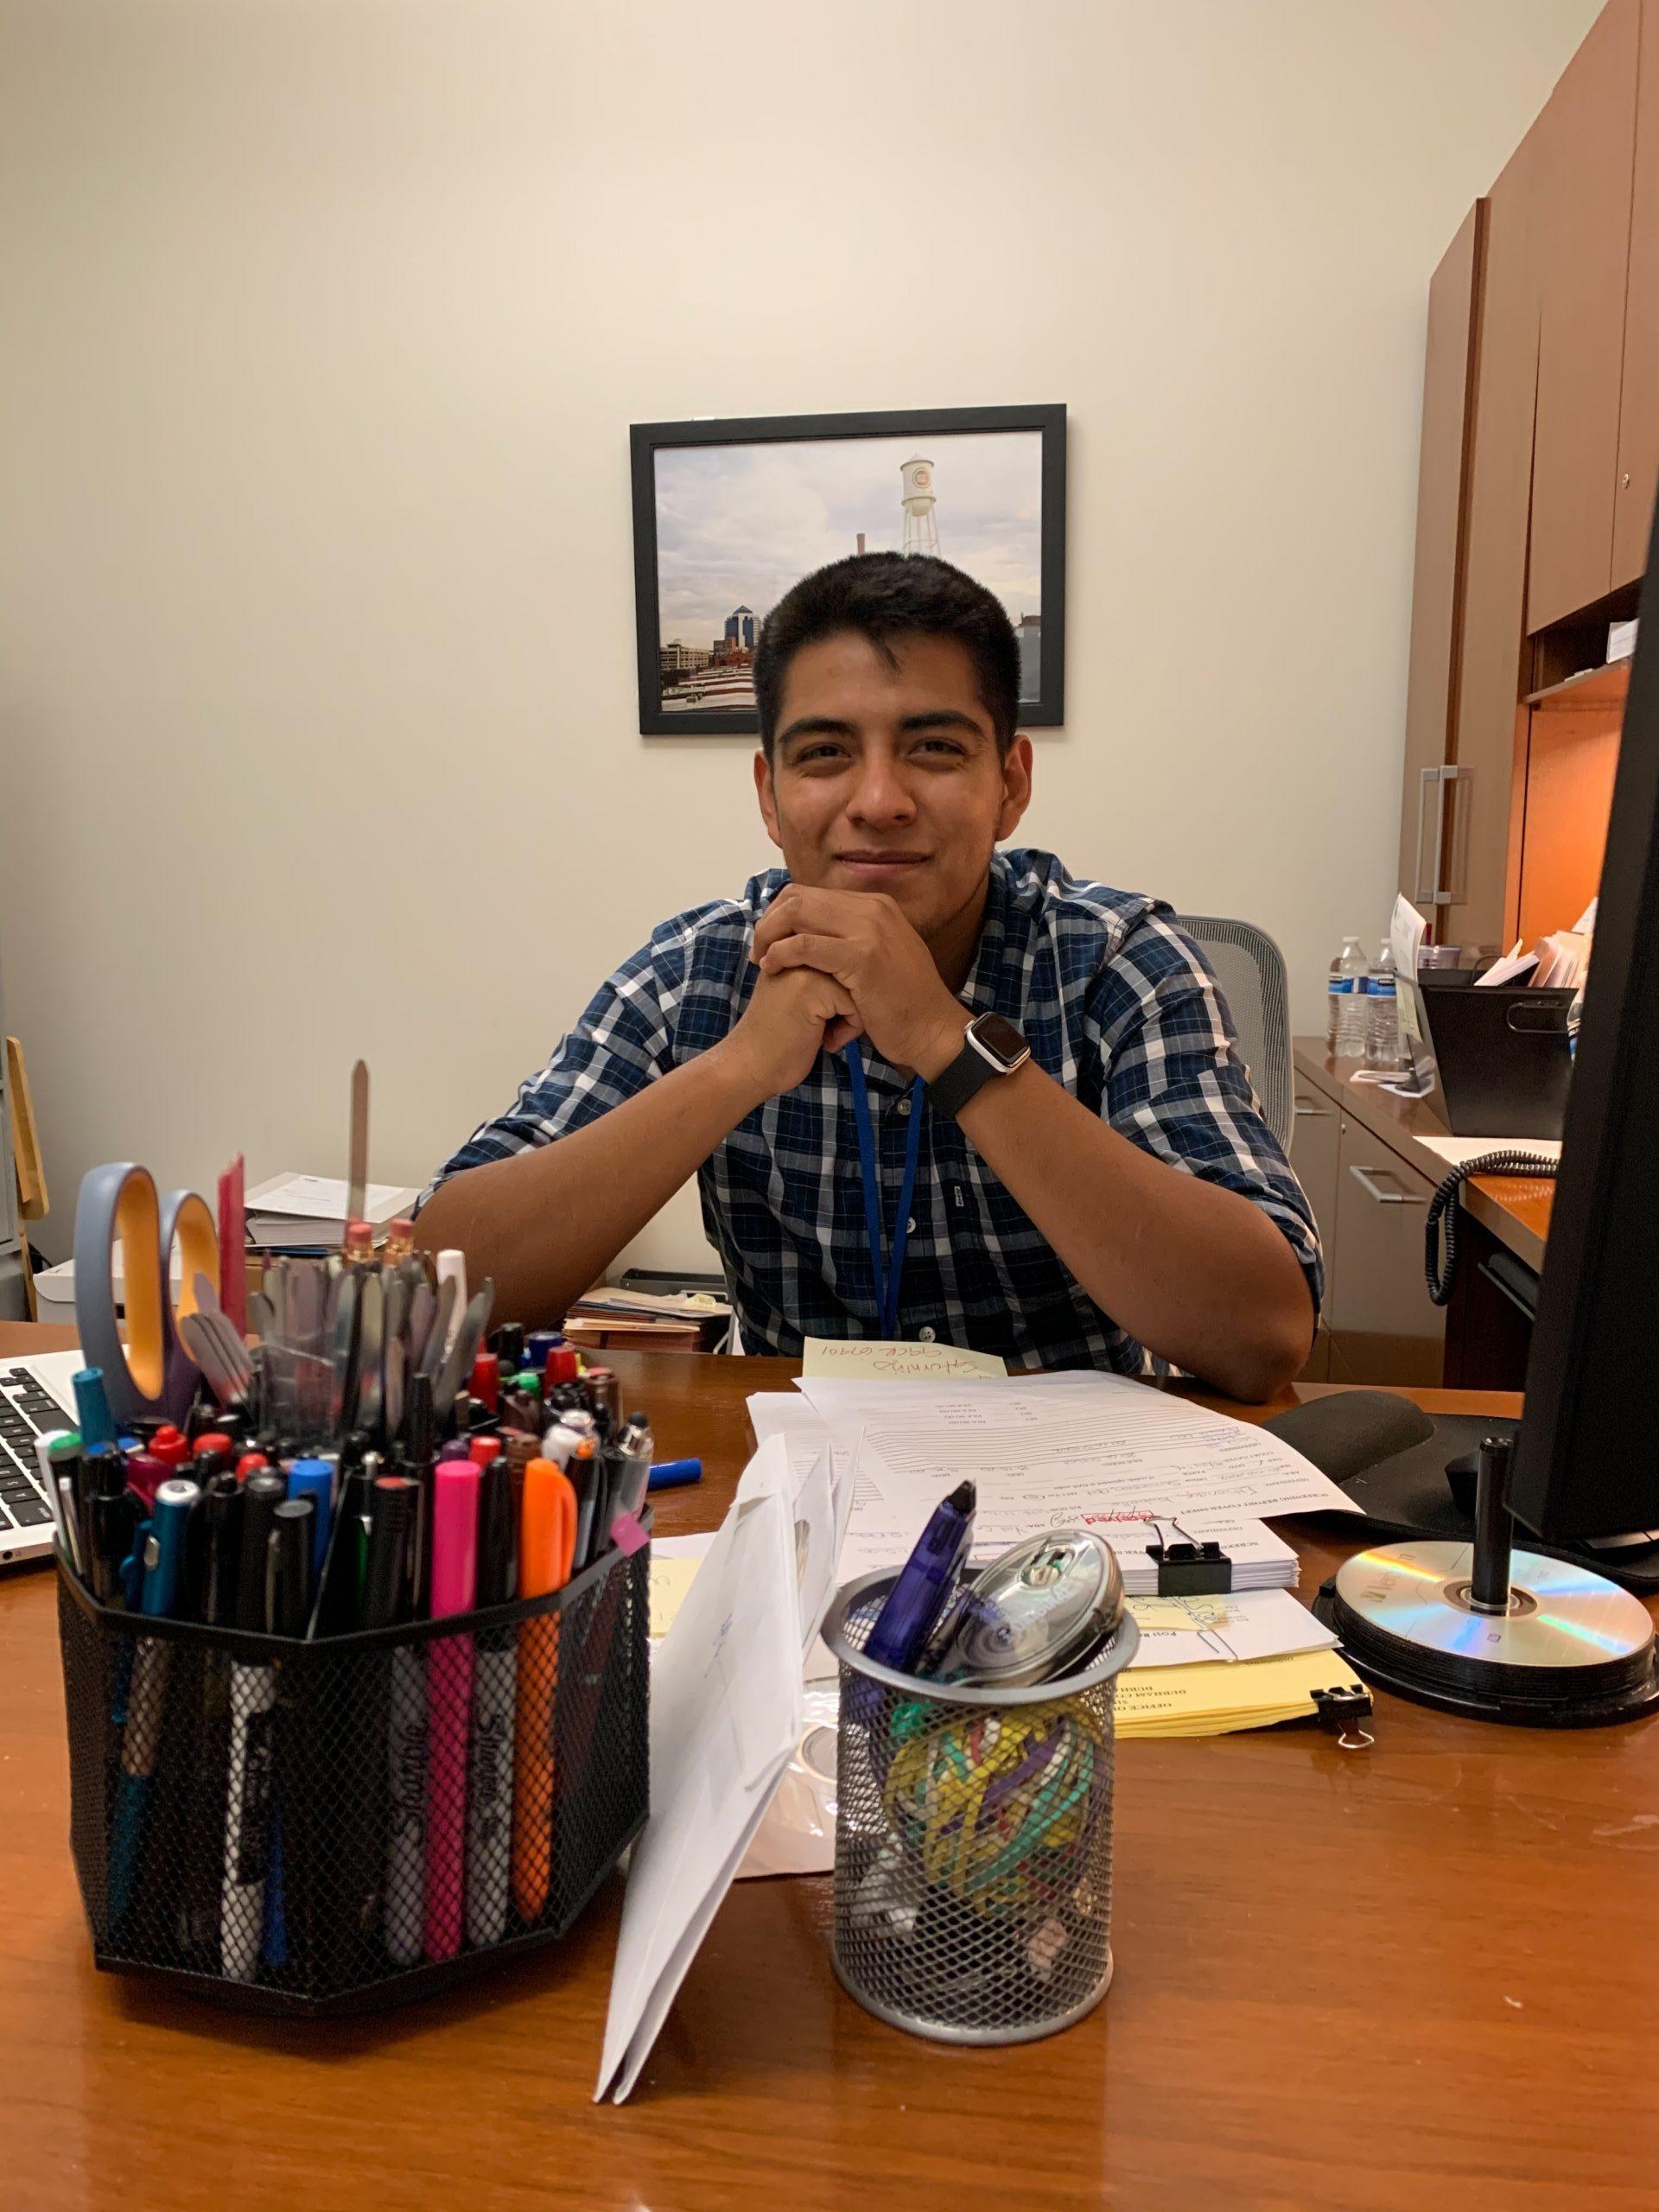 Erick Jimenez, Sociology Internship 2020 at Family Services of the Piedmont